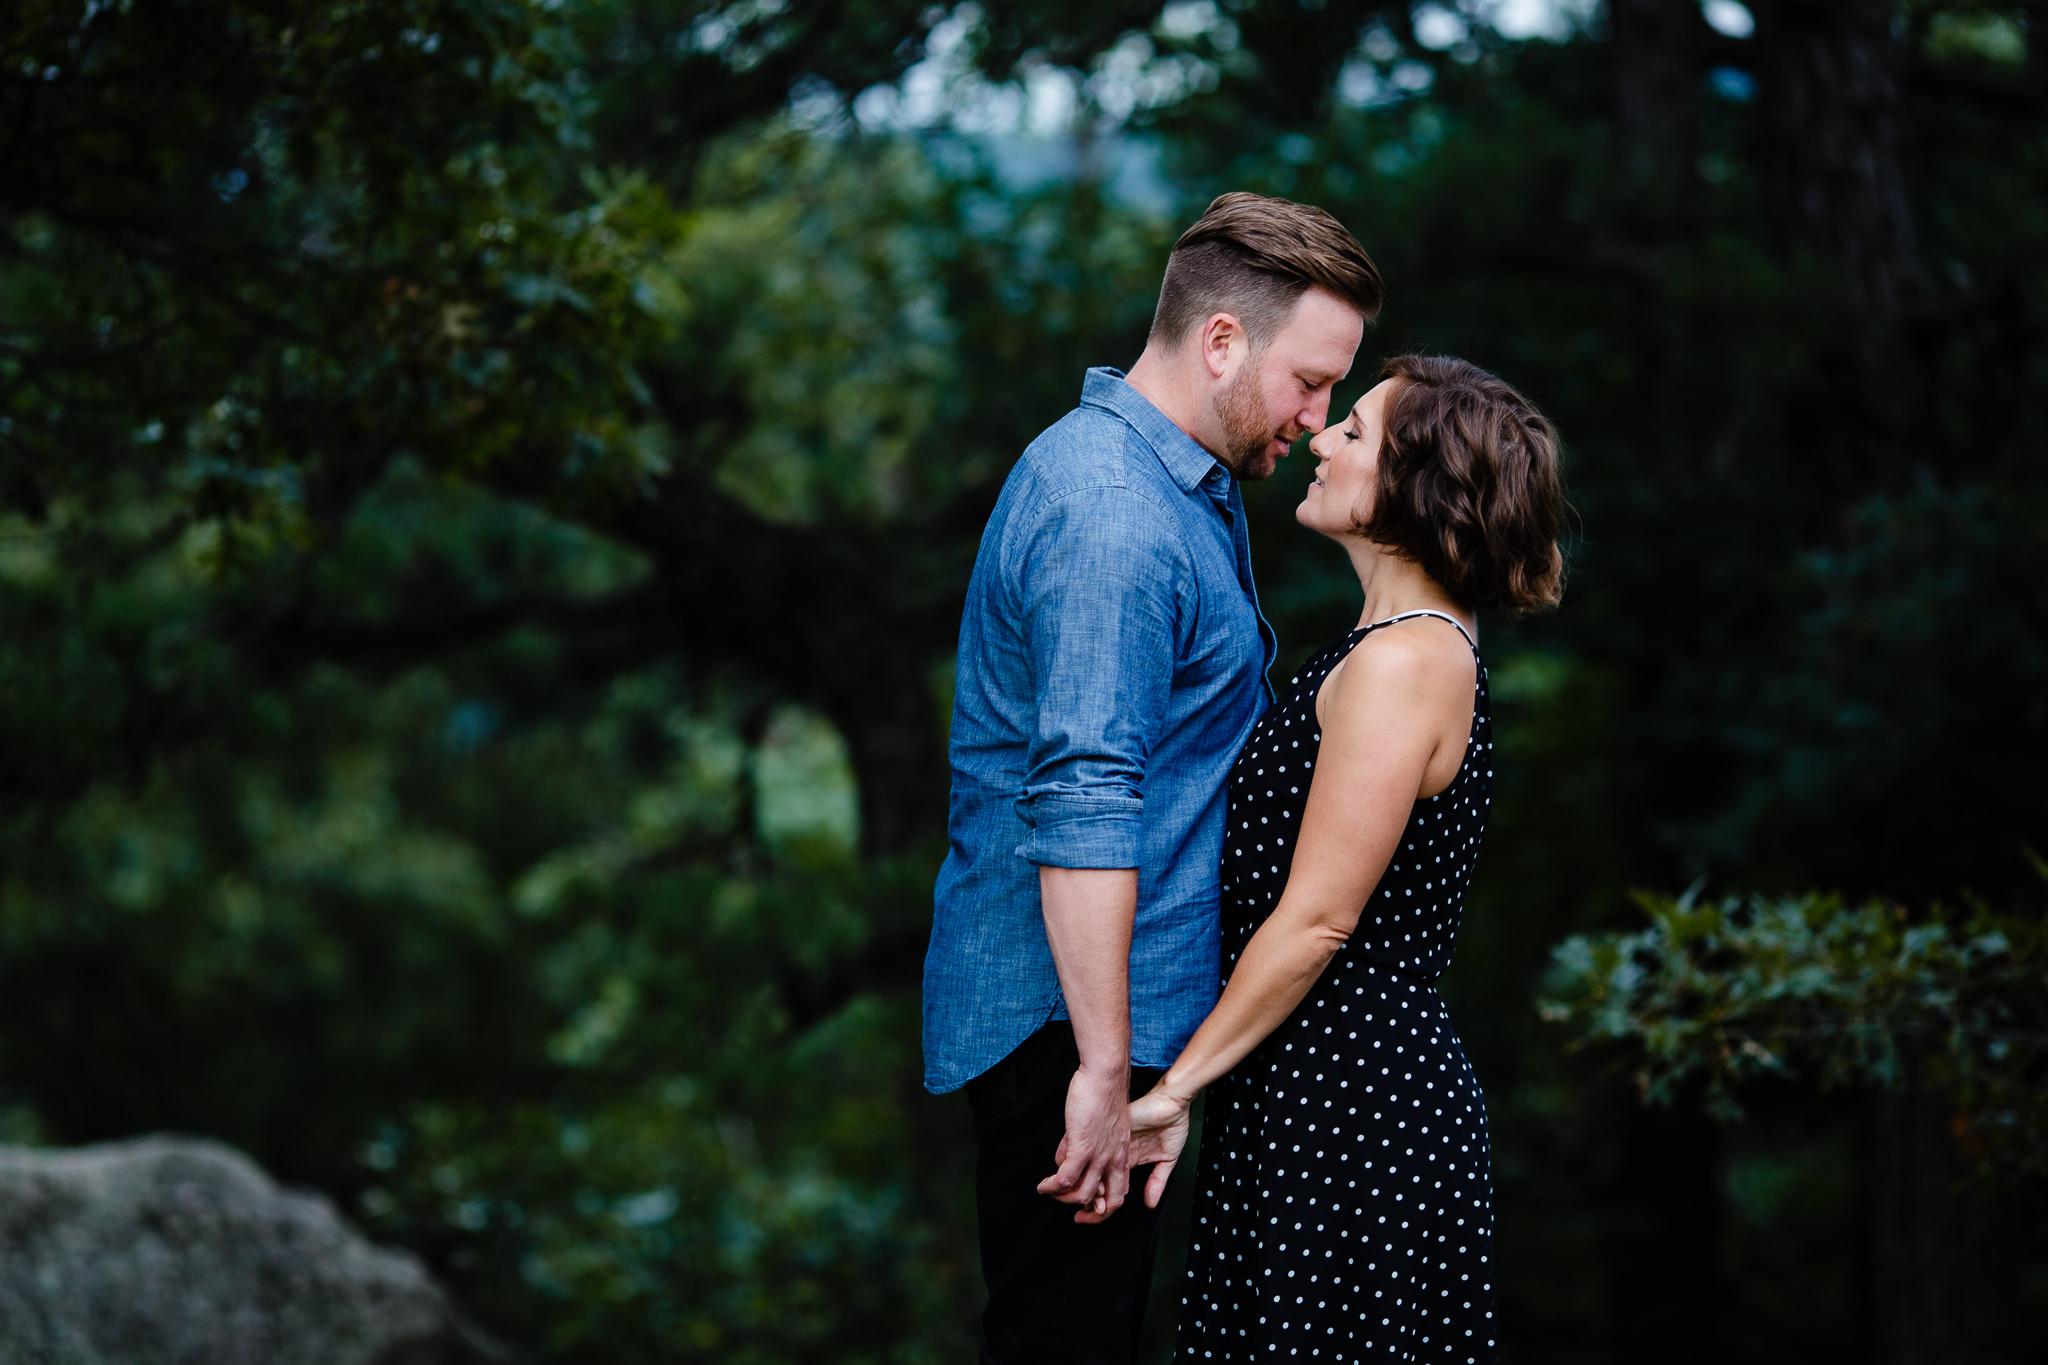 Bear-Mountain-Engagement-Photos-Hudson-Valley-Wedding-Photographer-36.jpg